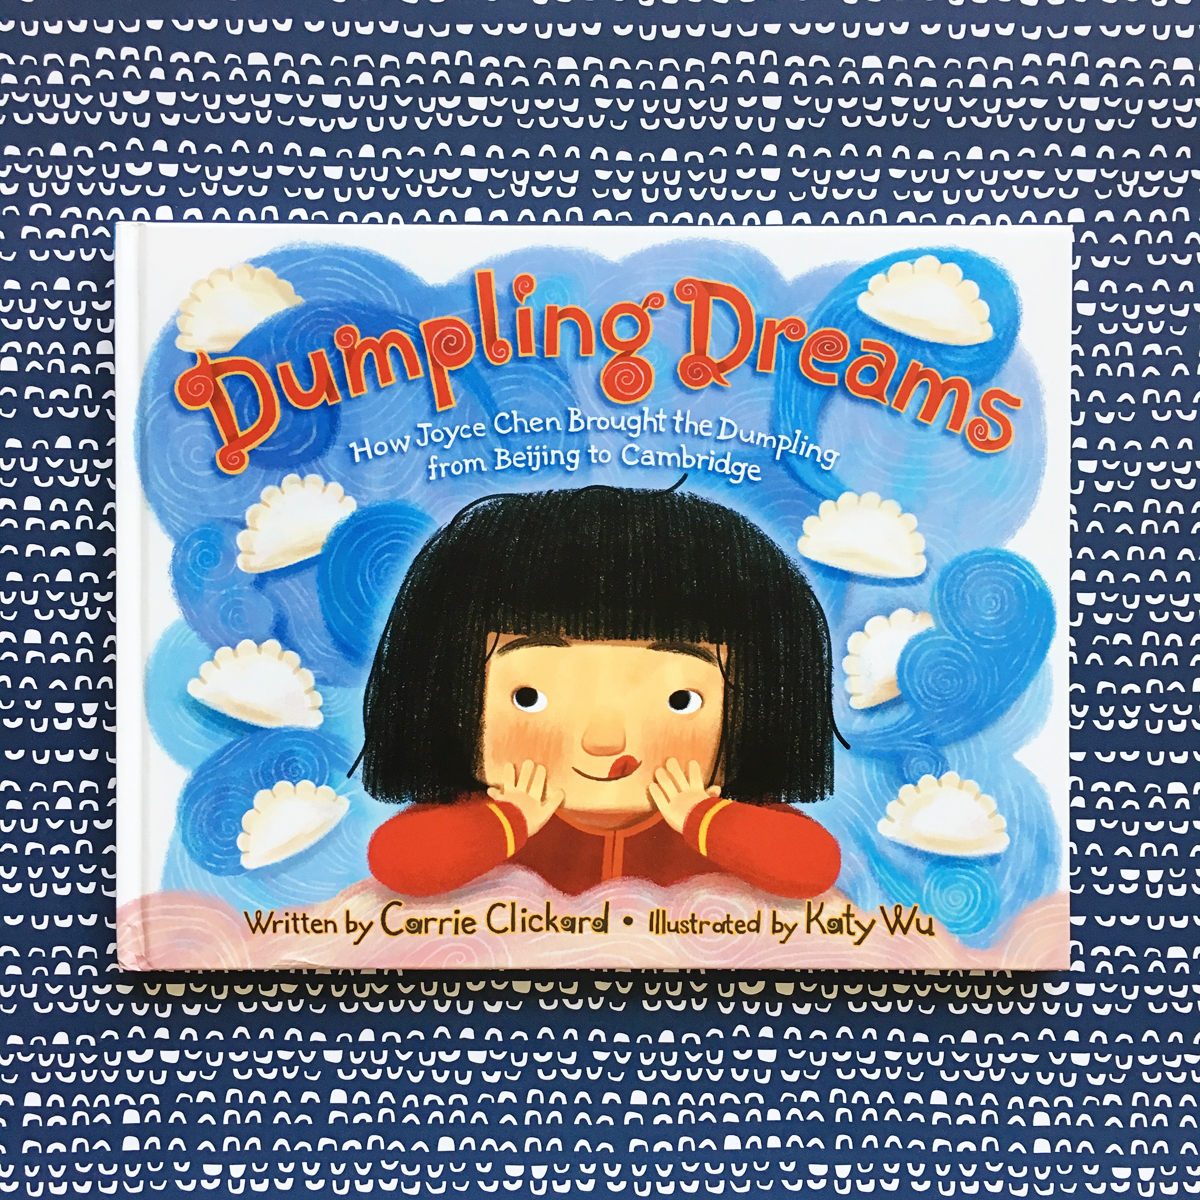 Dumpling Dreams: How Joyce Chen Brought the Dumpling from Beijing to Cambridge | Books For Diversity